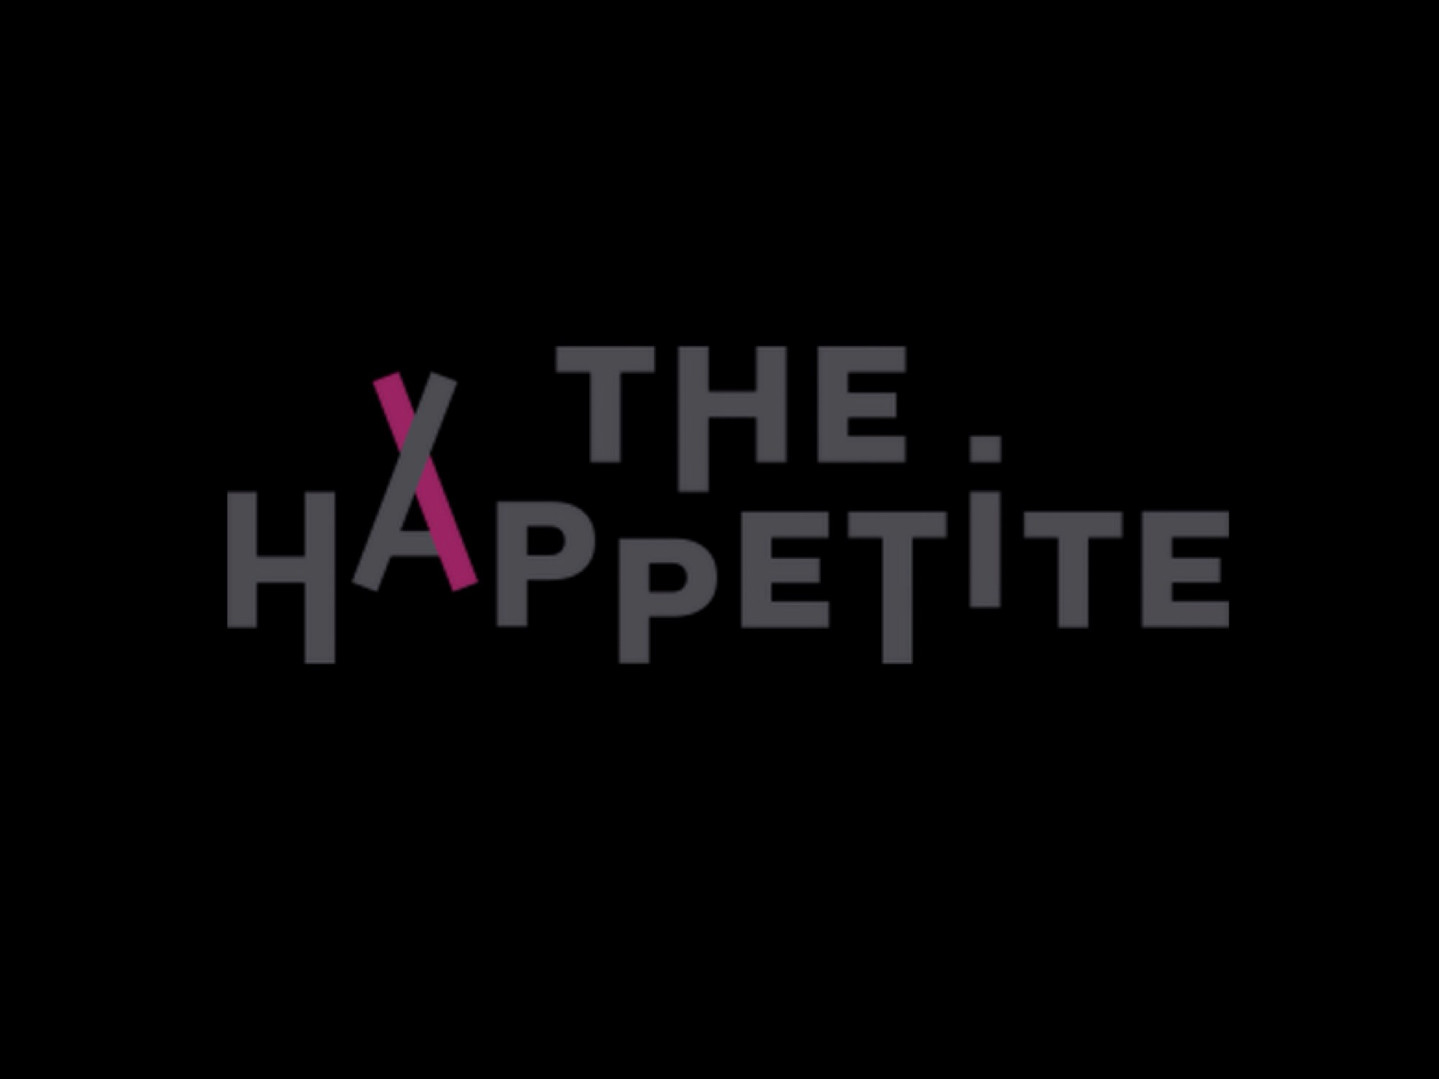 The Happetite - Milan, Italy